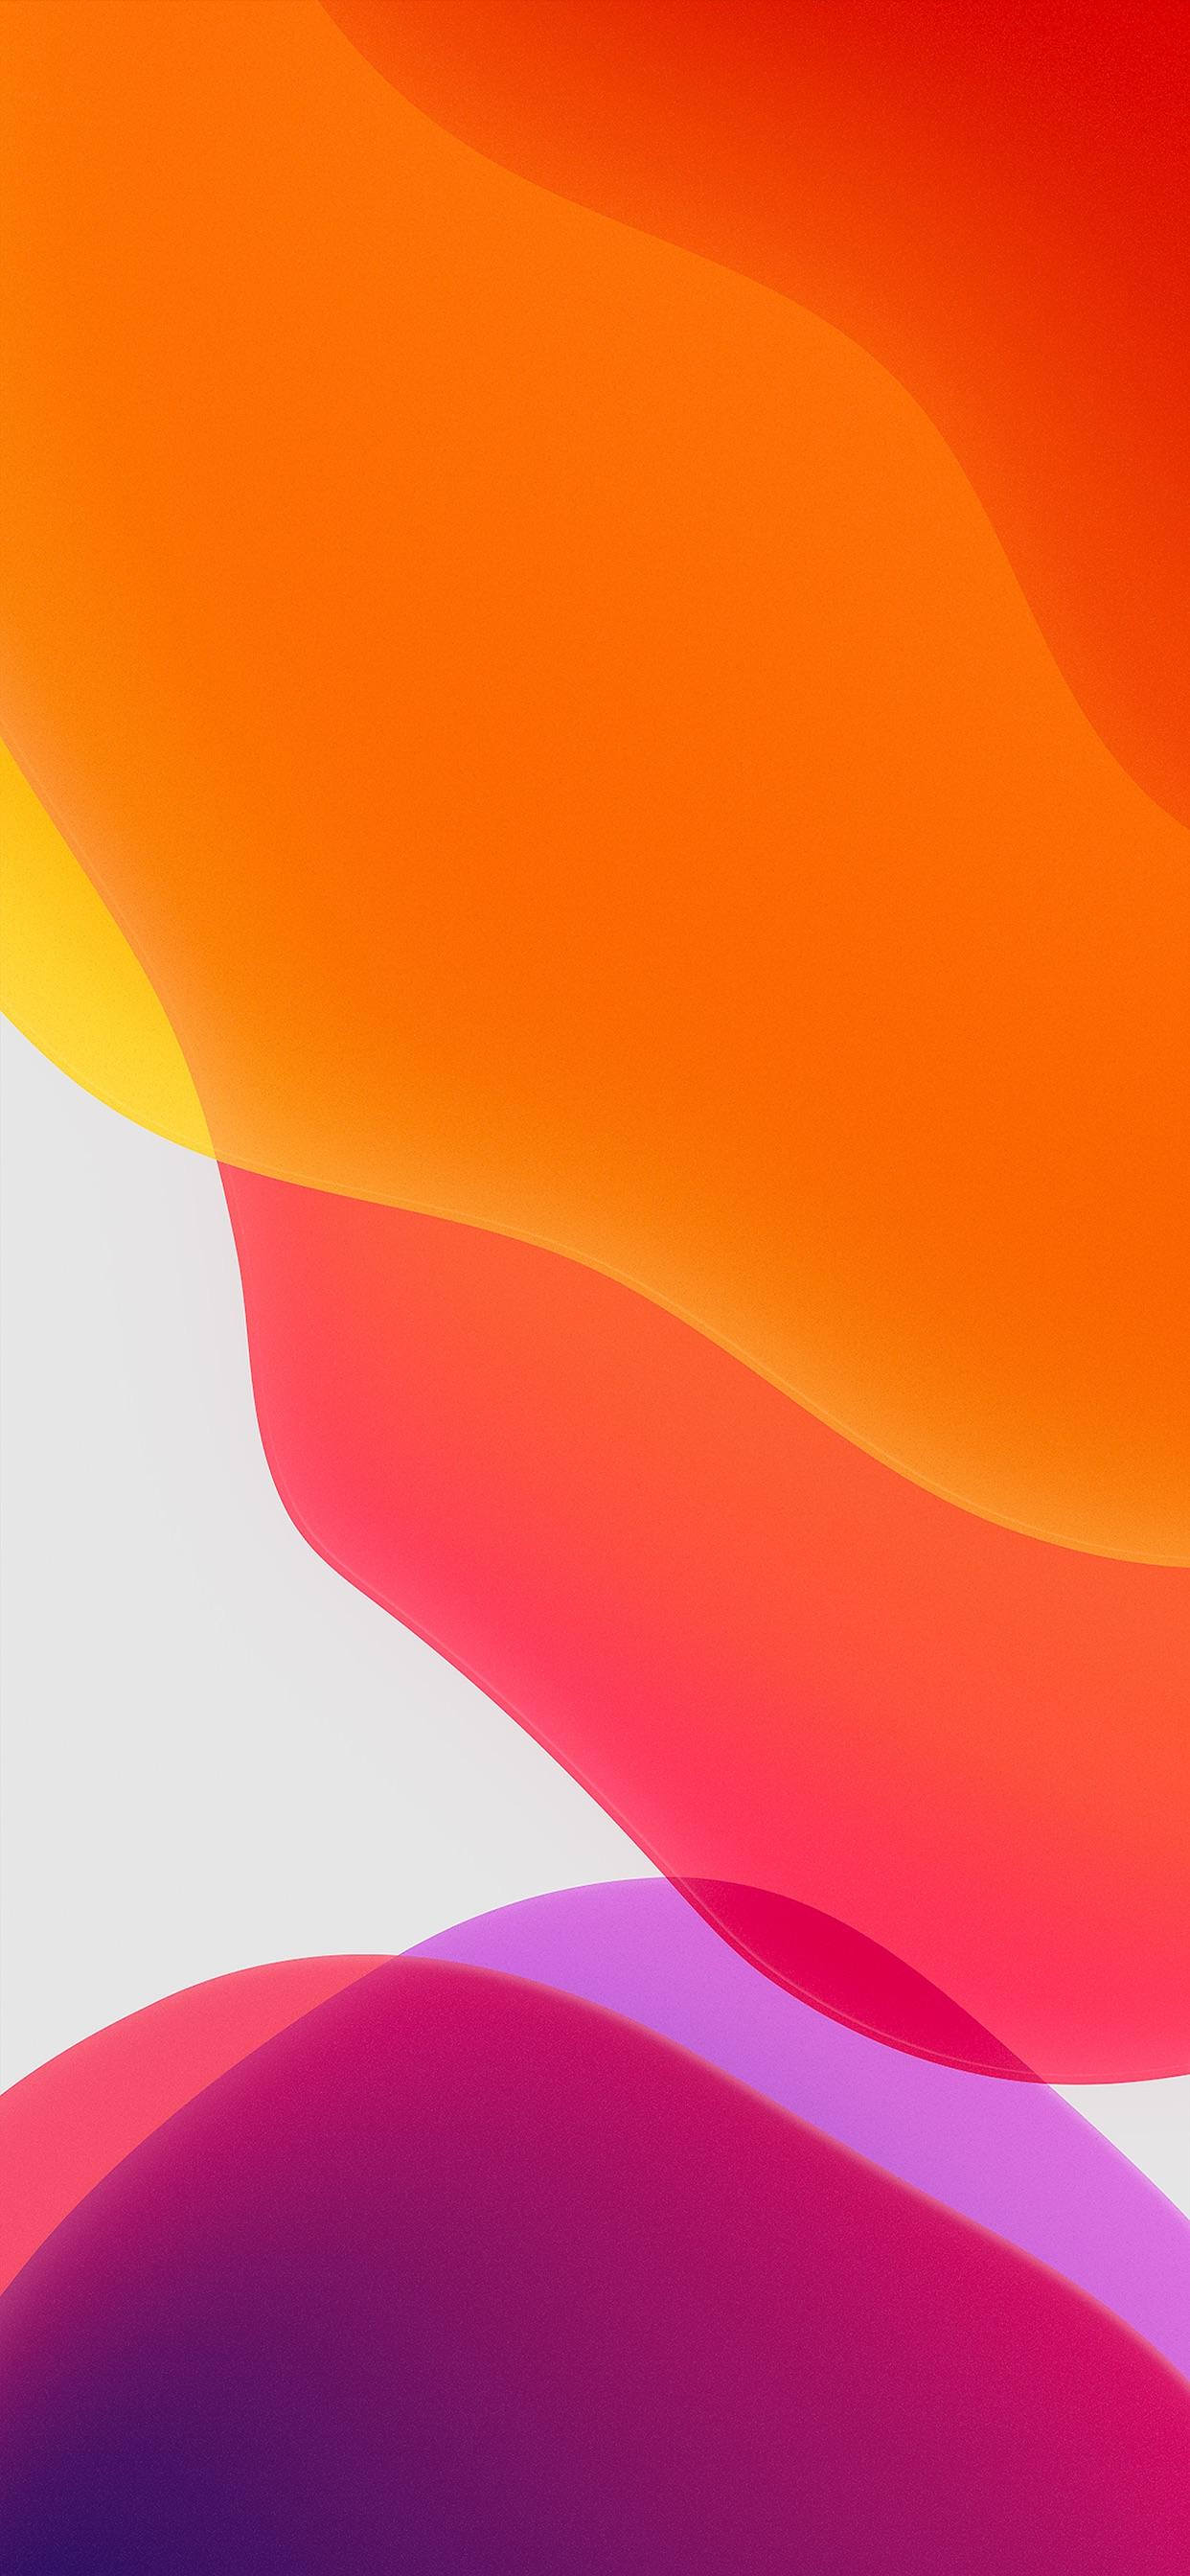 Apfel Hintergründe iPhone 21   ios wallpaper hd   21x21 ...